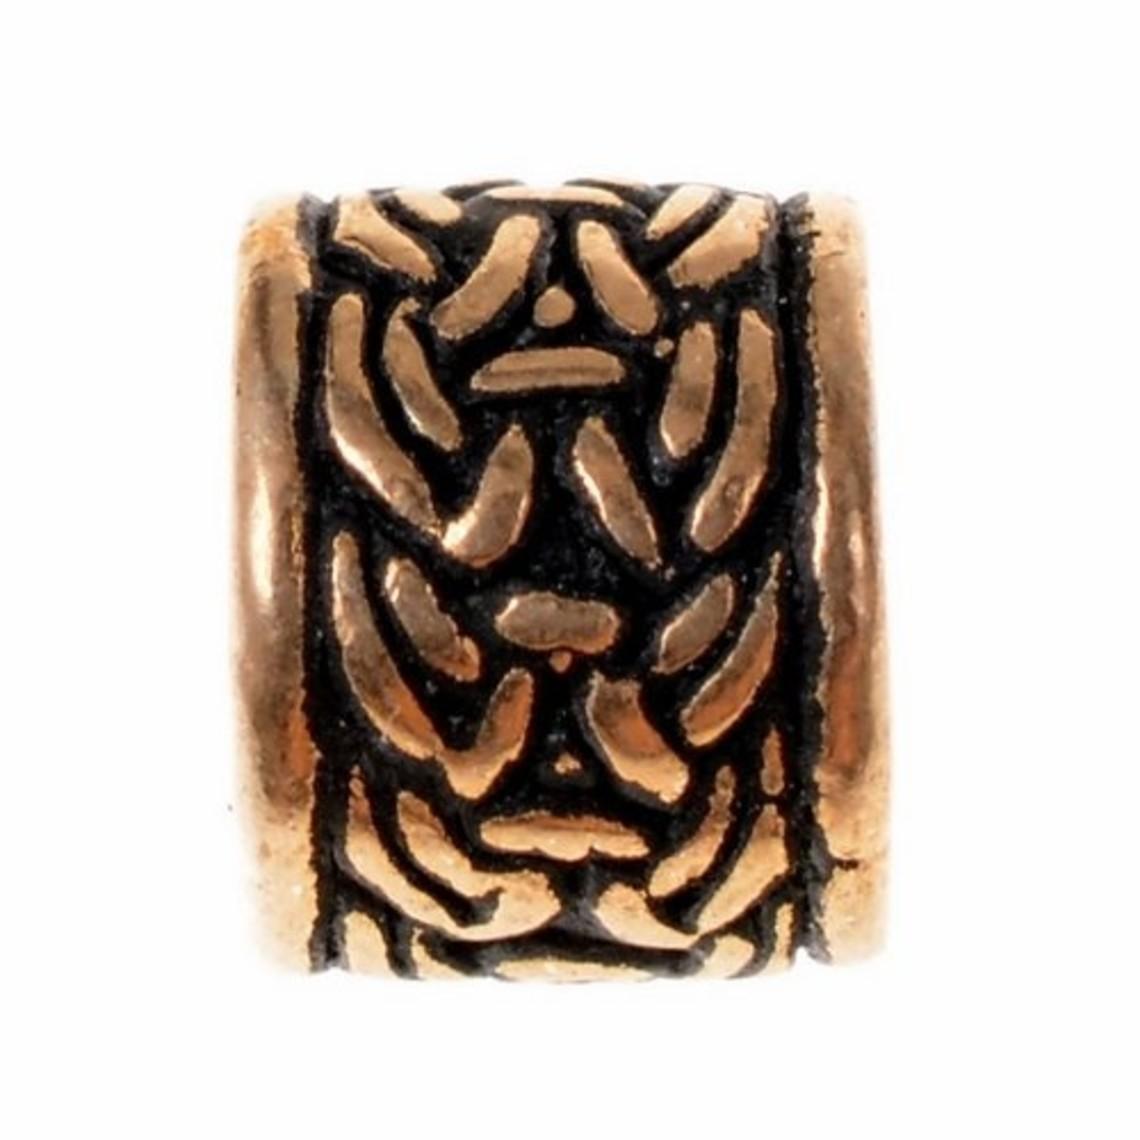 Viking skæg perle med knude motiv, bronze